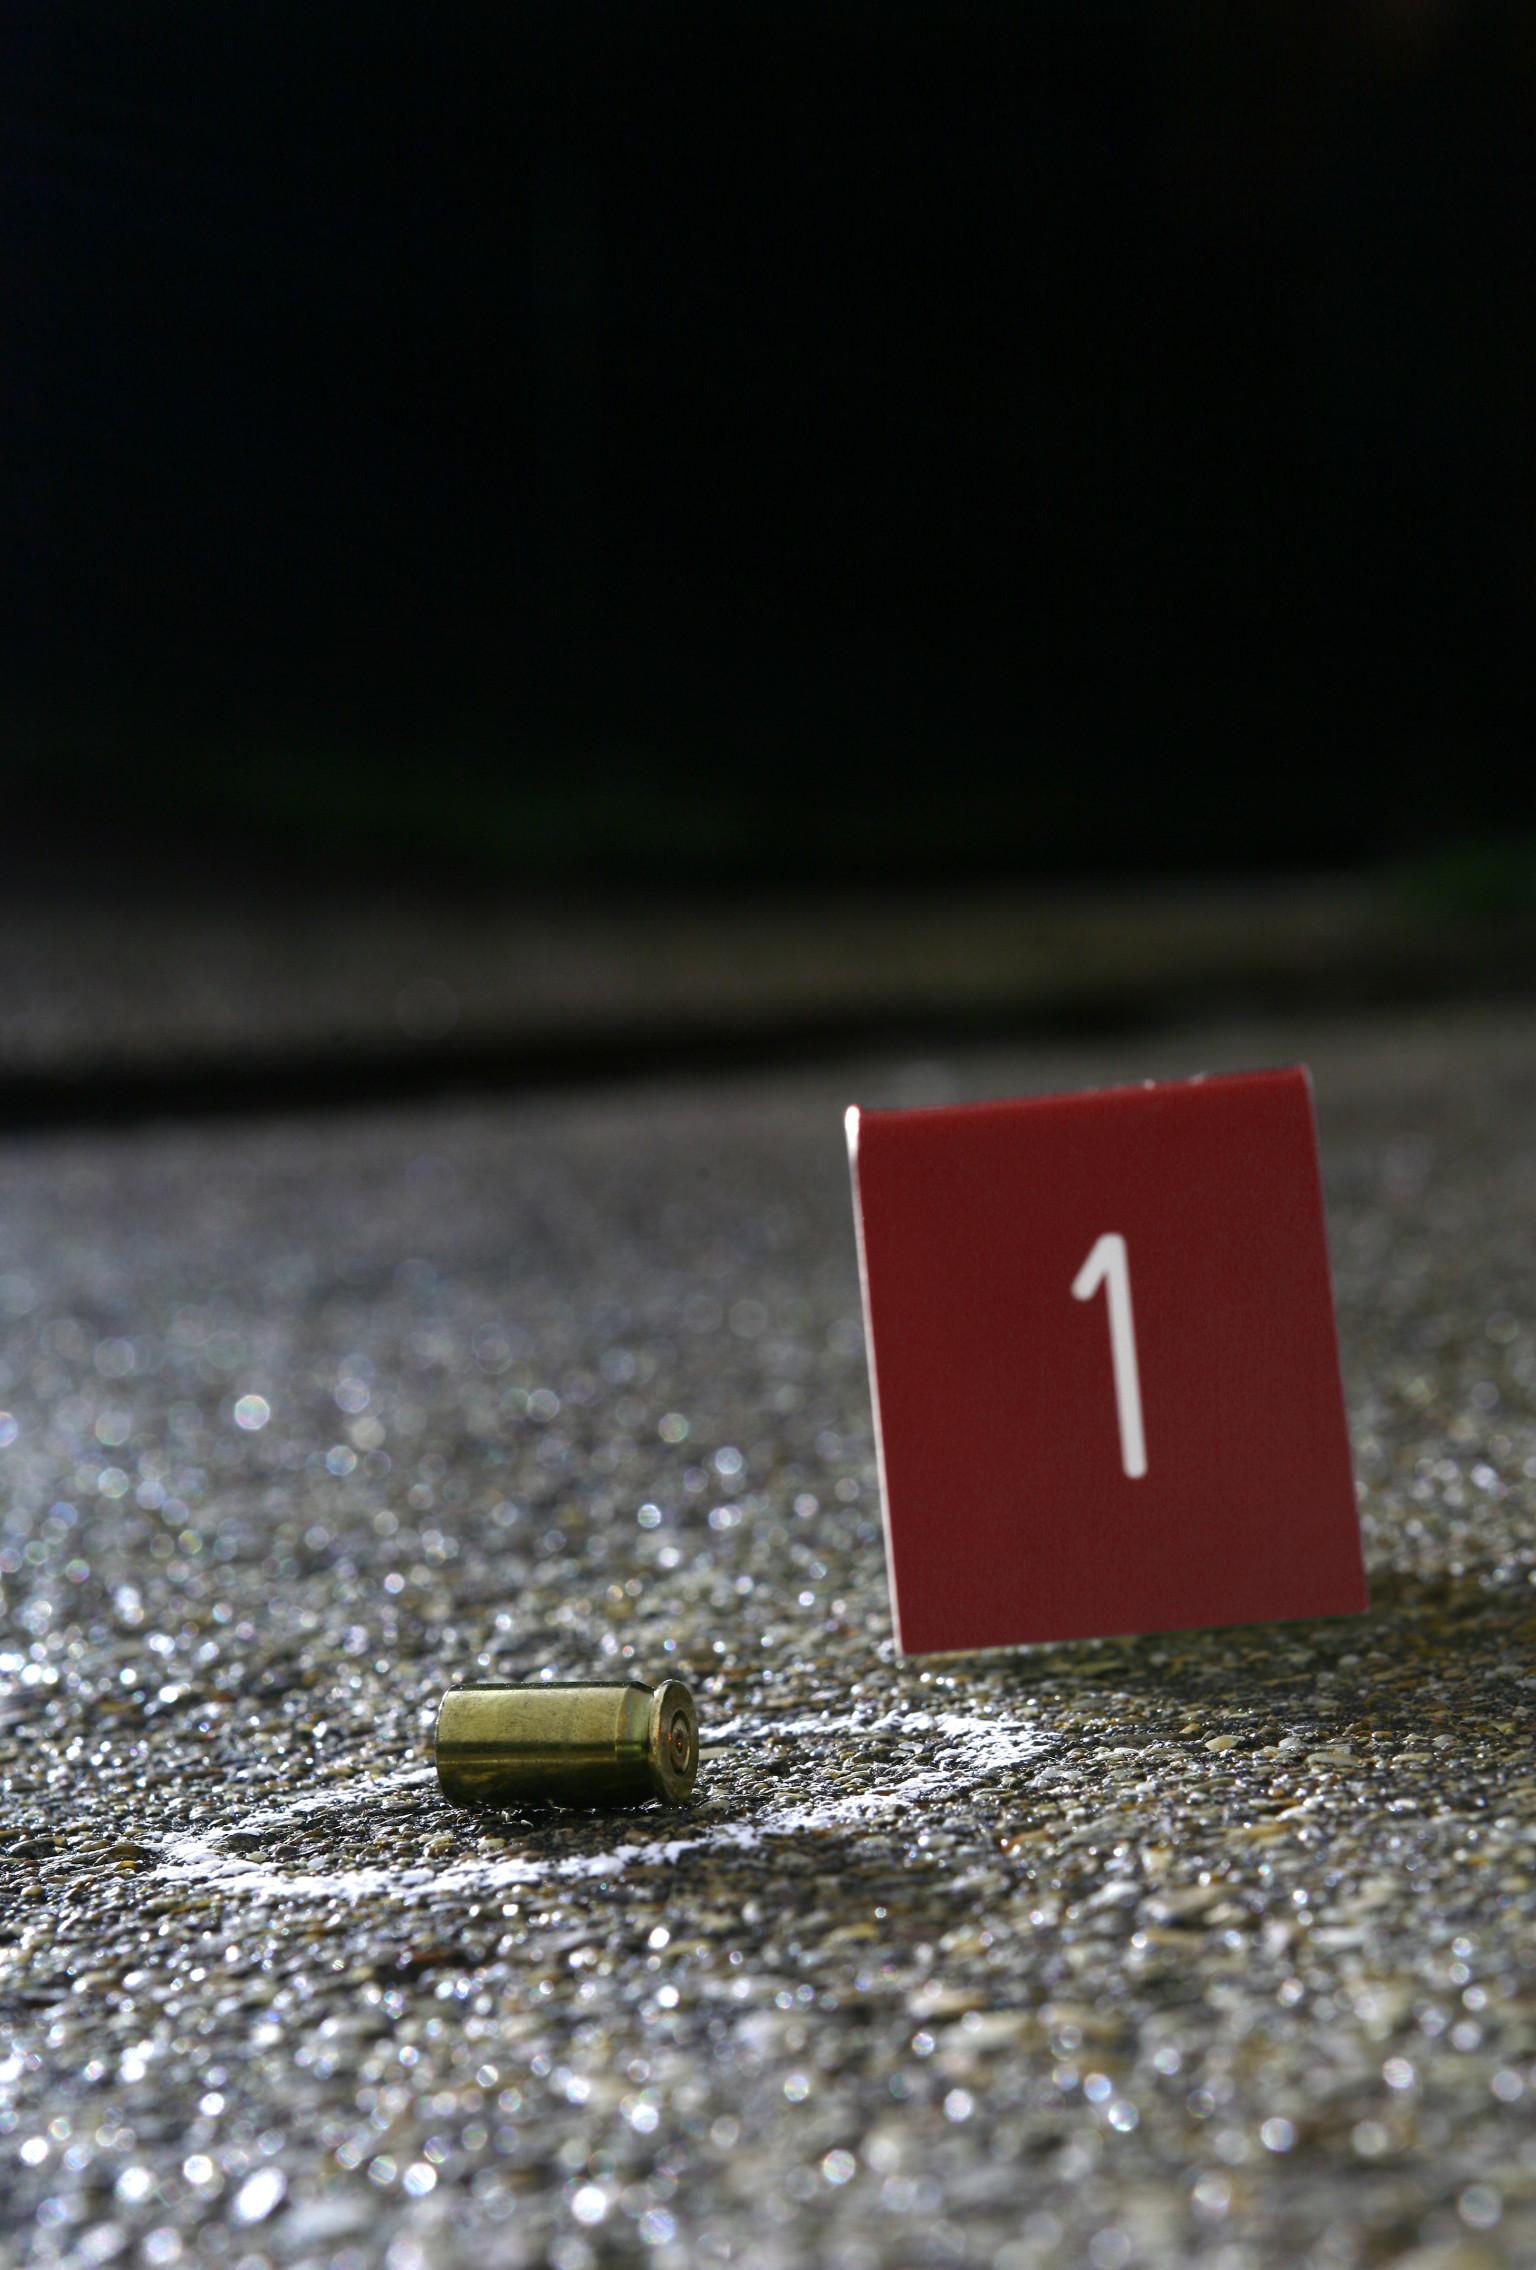 Damani Henard Ashley Hardmon Shot Chicago Boy 14 And